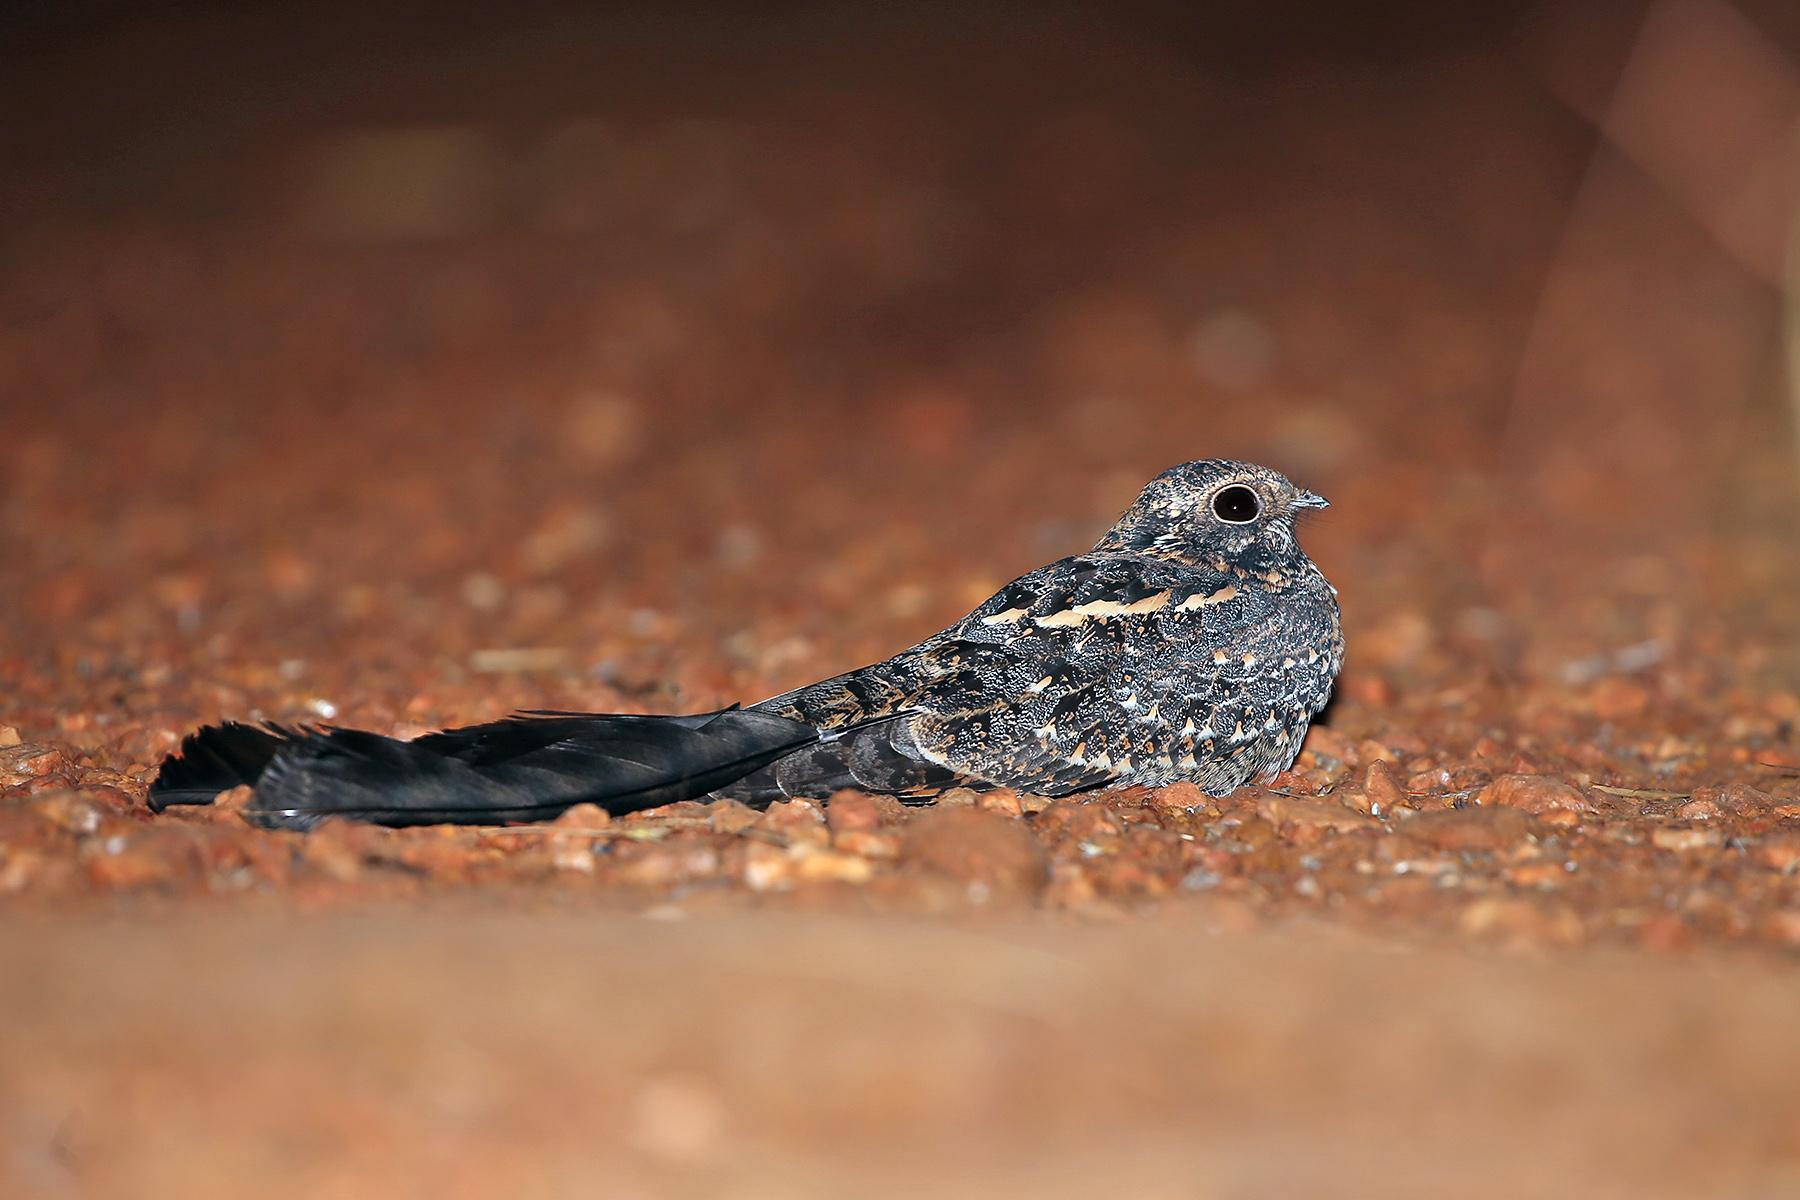 Standard-winged Nightjar in Ghana (image by Janos Olah)